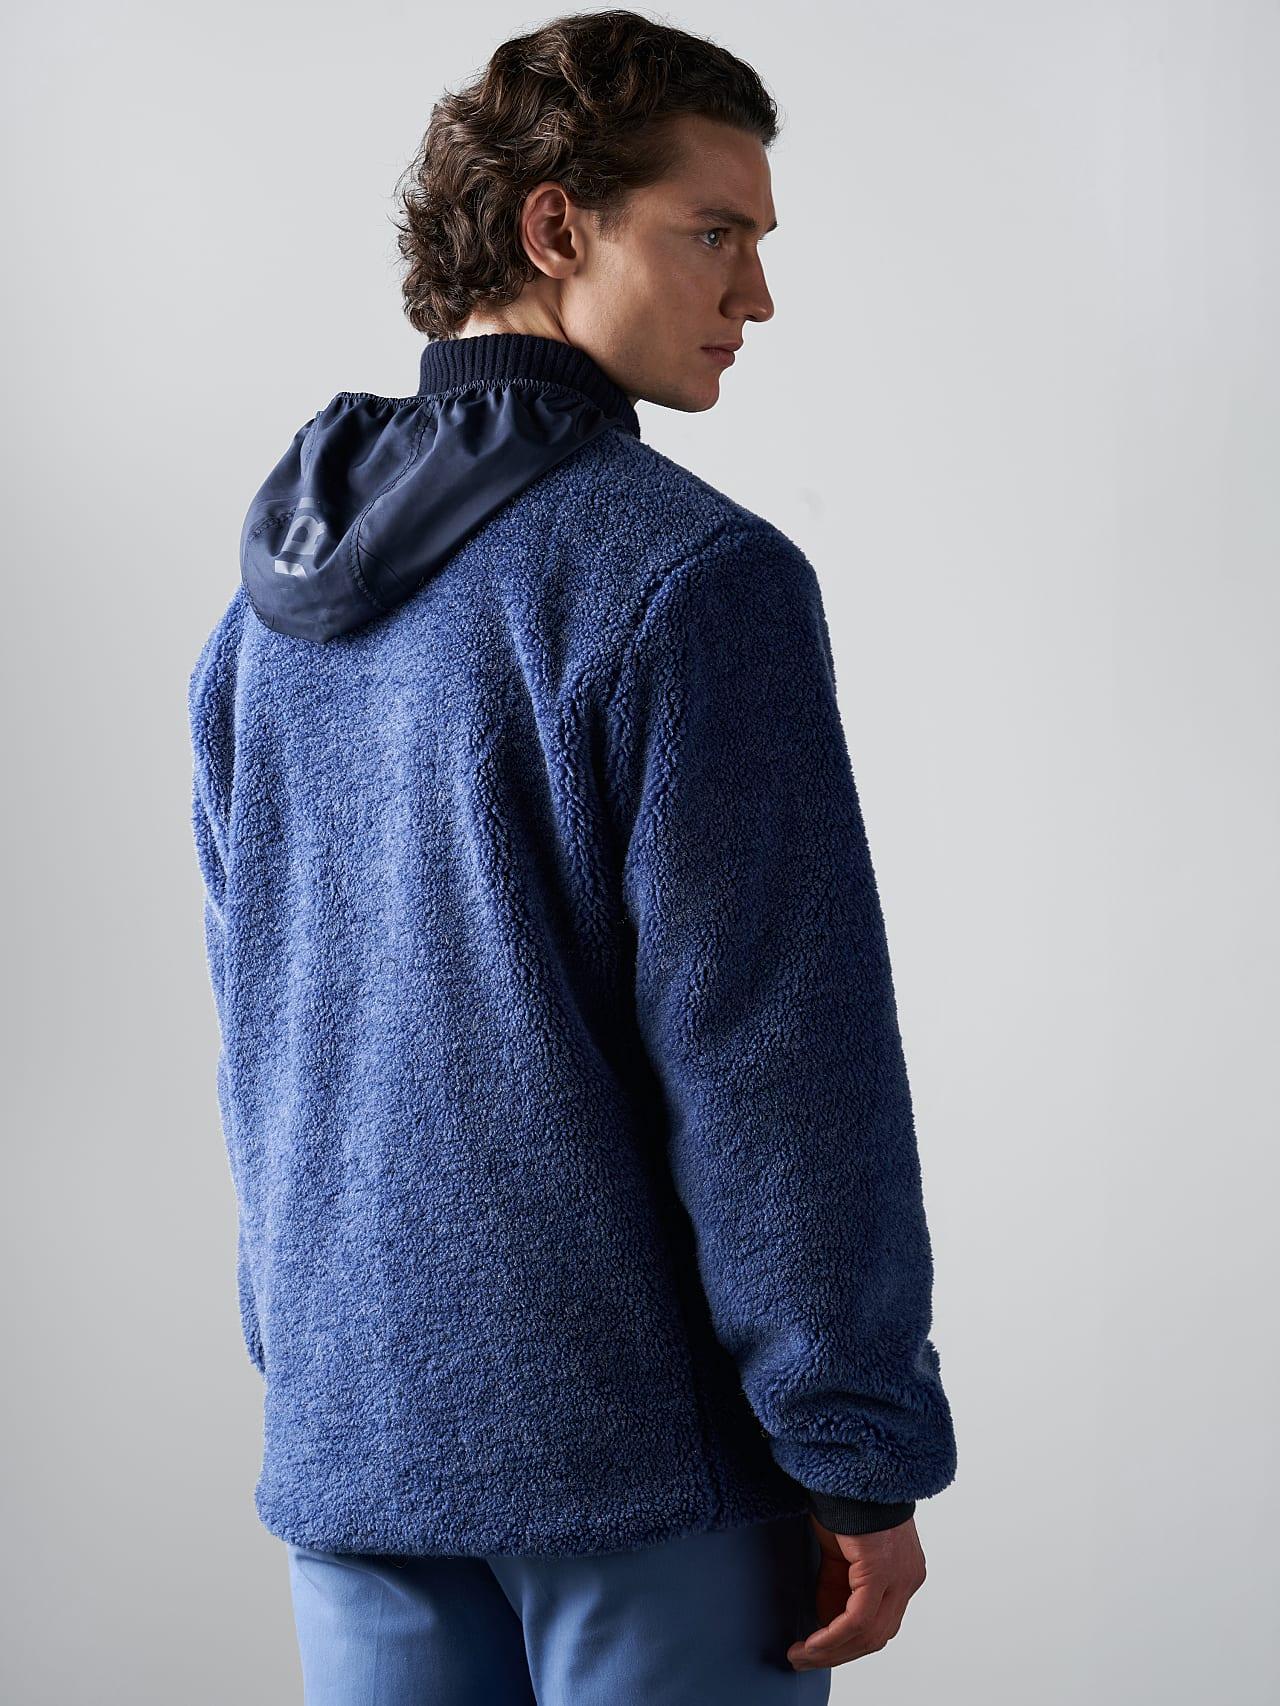 OVEDY V1.Y5.02 Reversible Wool-Blend Teddy Jacket light blue Front Main Alpha Tauri